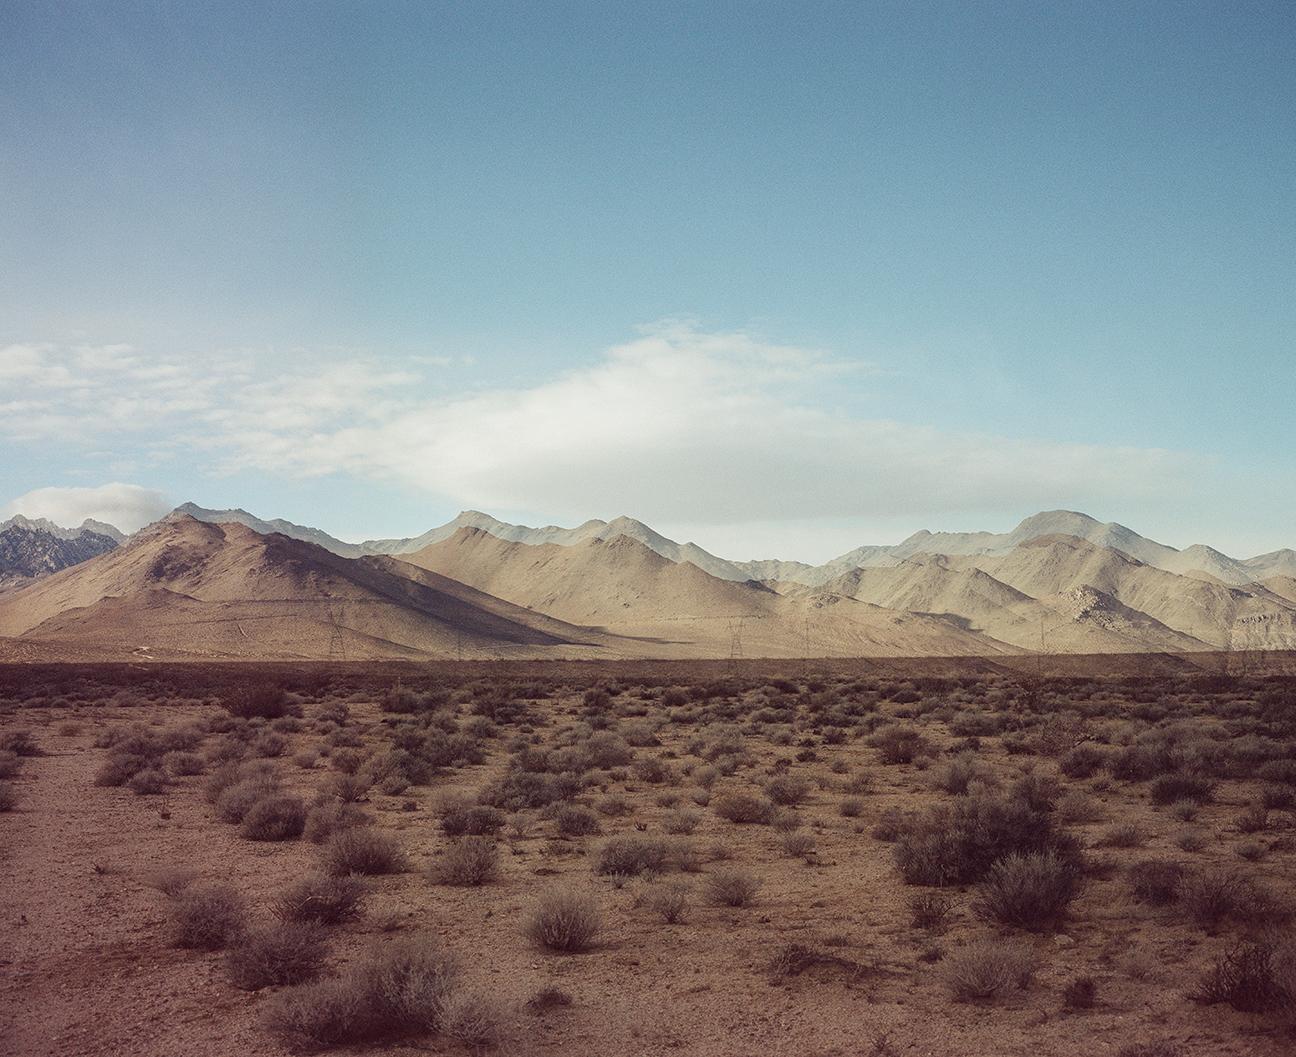 Double exposure desert off the 395_0014.jpg